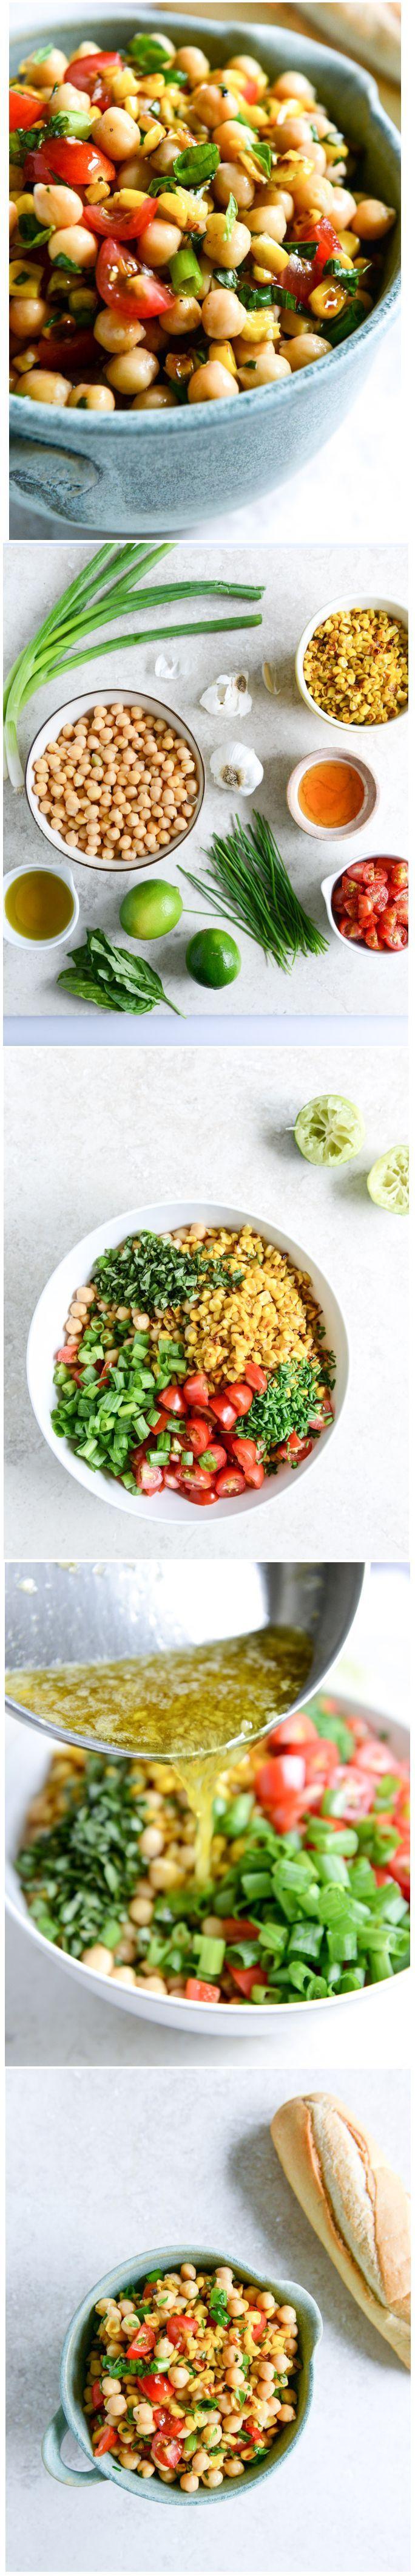 Summer Chickpea Salad with Honey Garlic Lime Vinaigrette